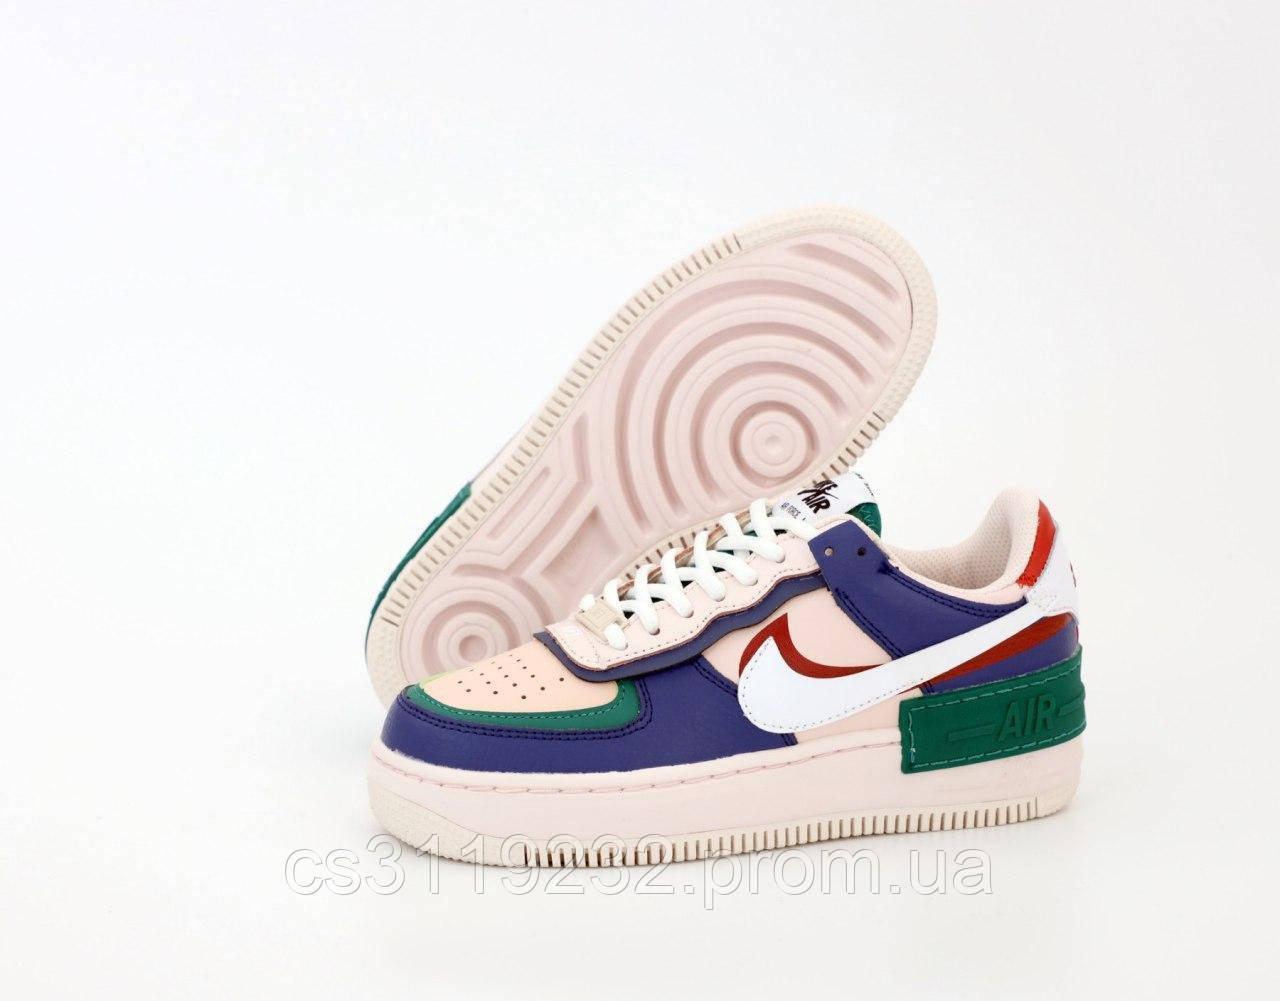 Женские кроссовки Nike Nike Air Force 1 White Green Blue (белый/зелёный/синий)